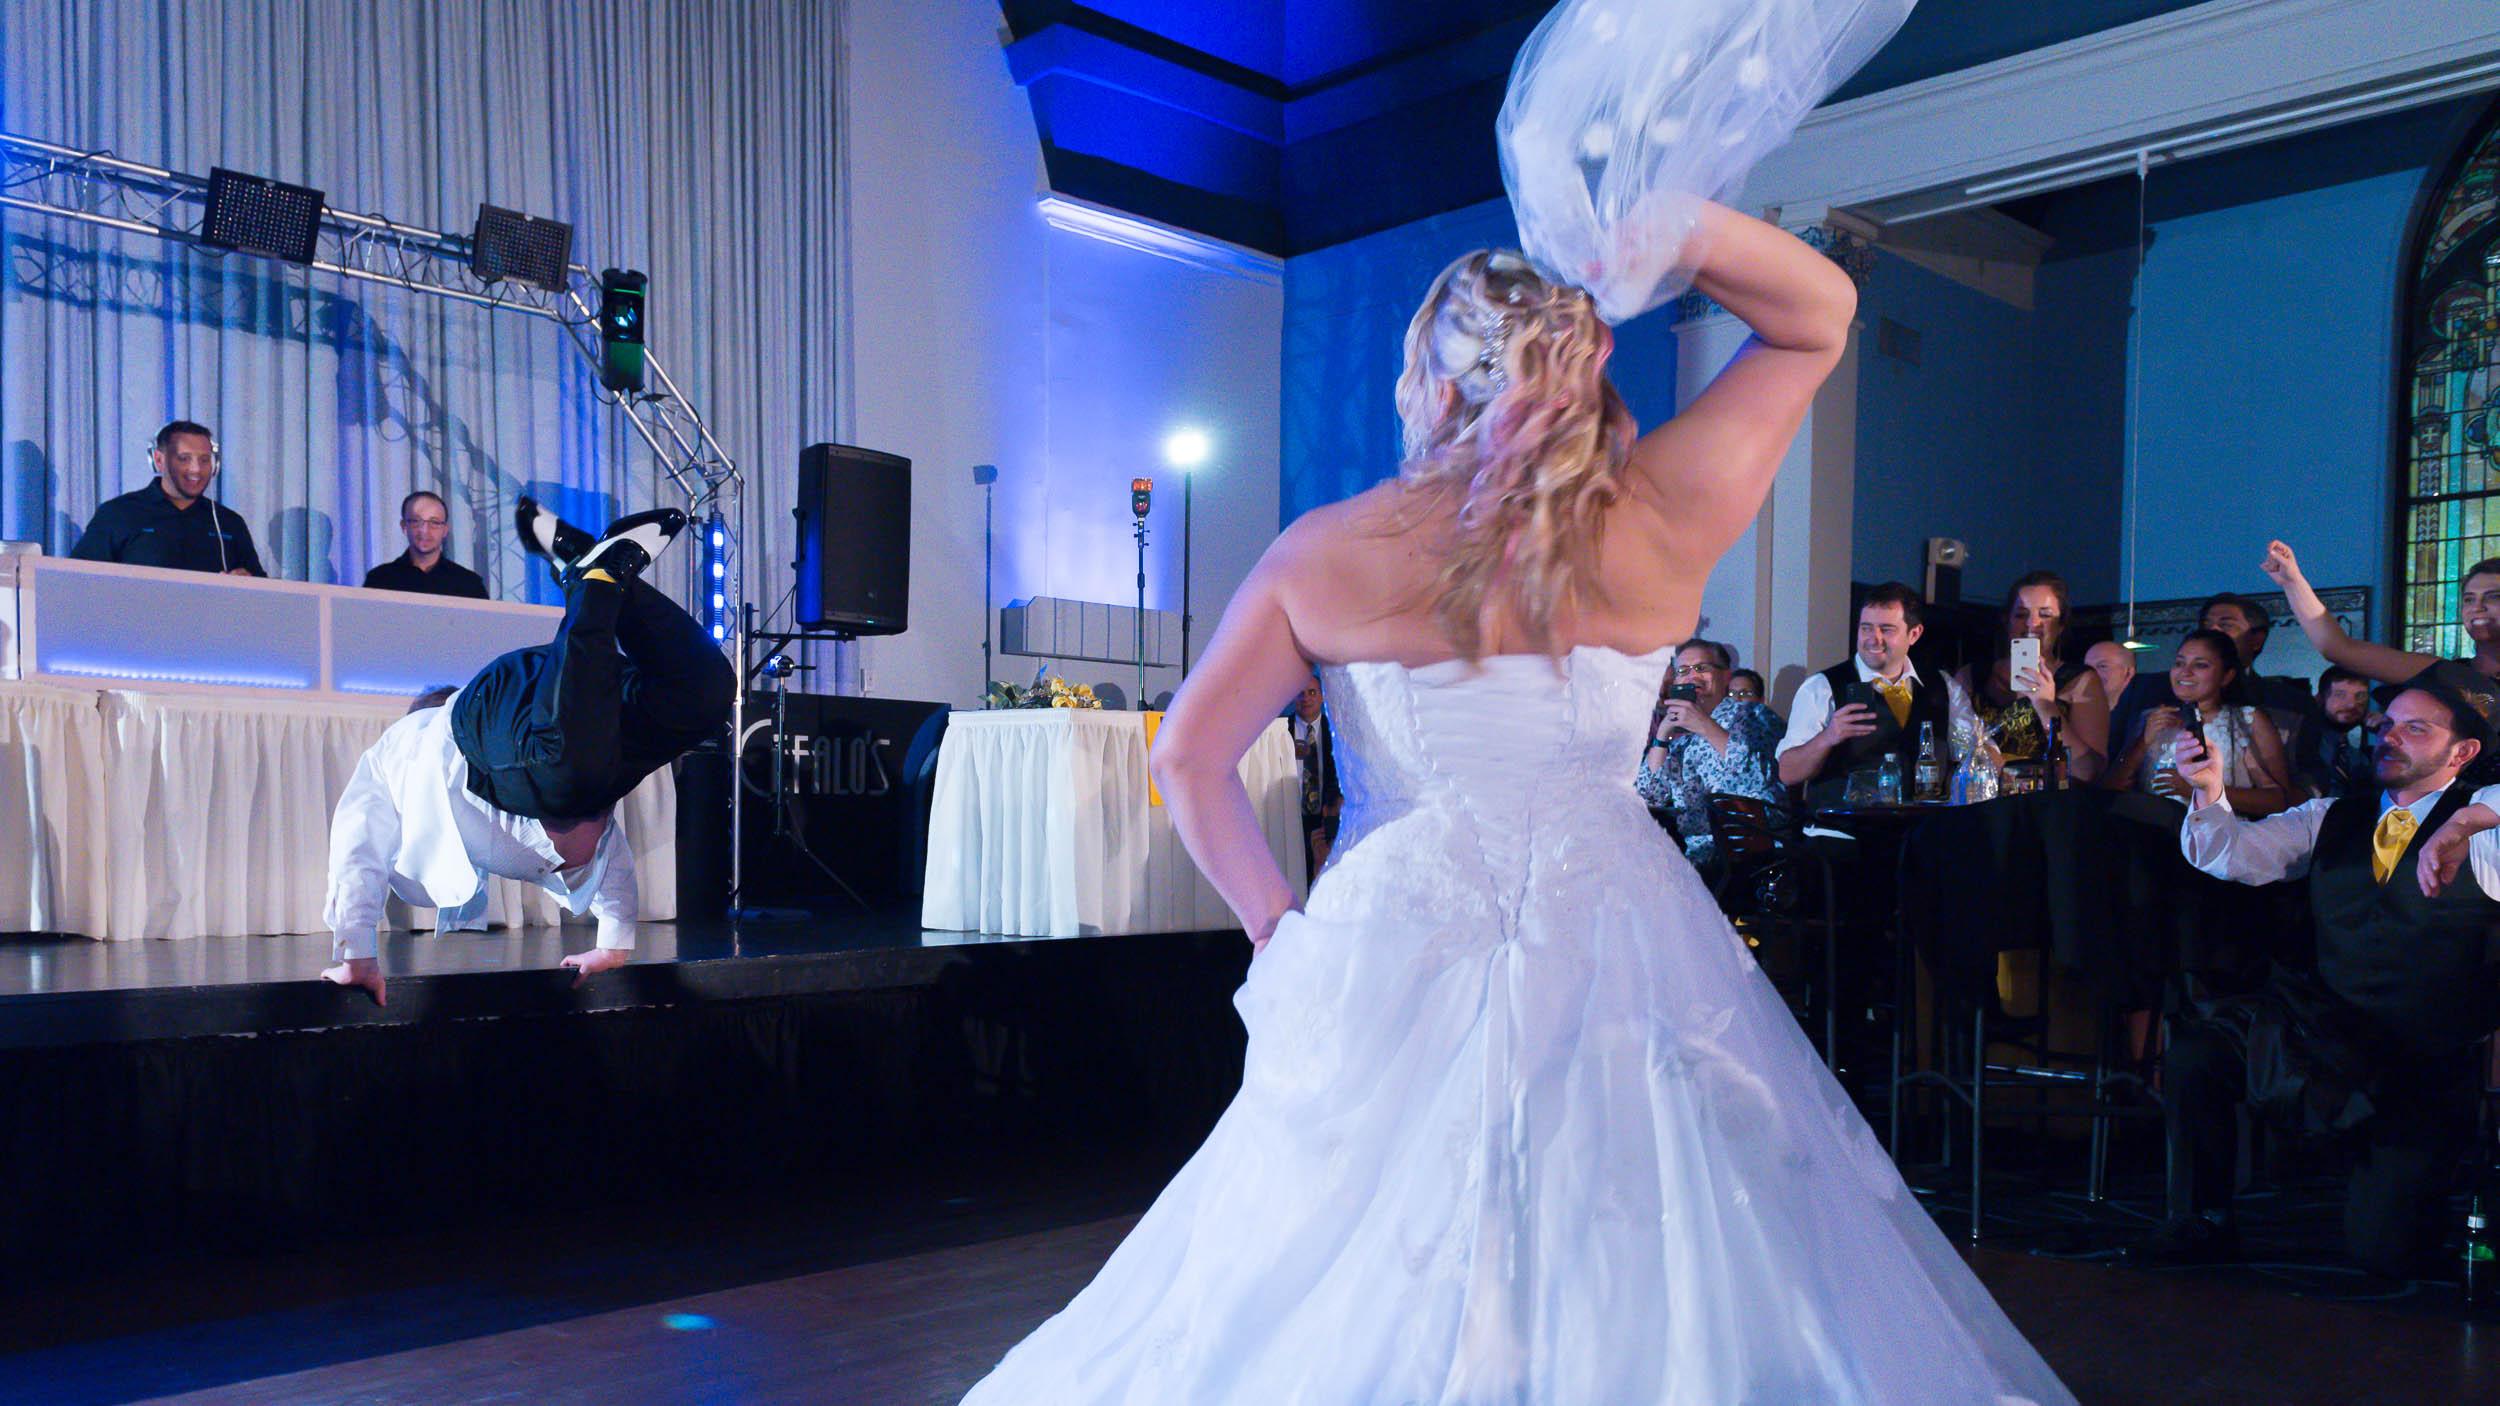 Wedding-Reception-Cefelos-Banquet-Event-Center-3.jpg